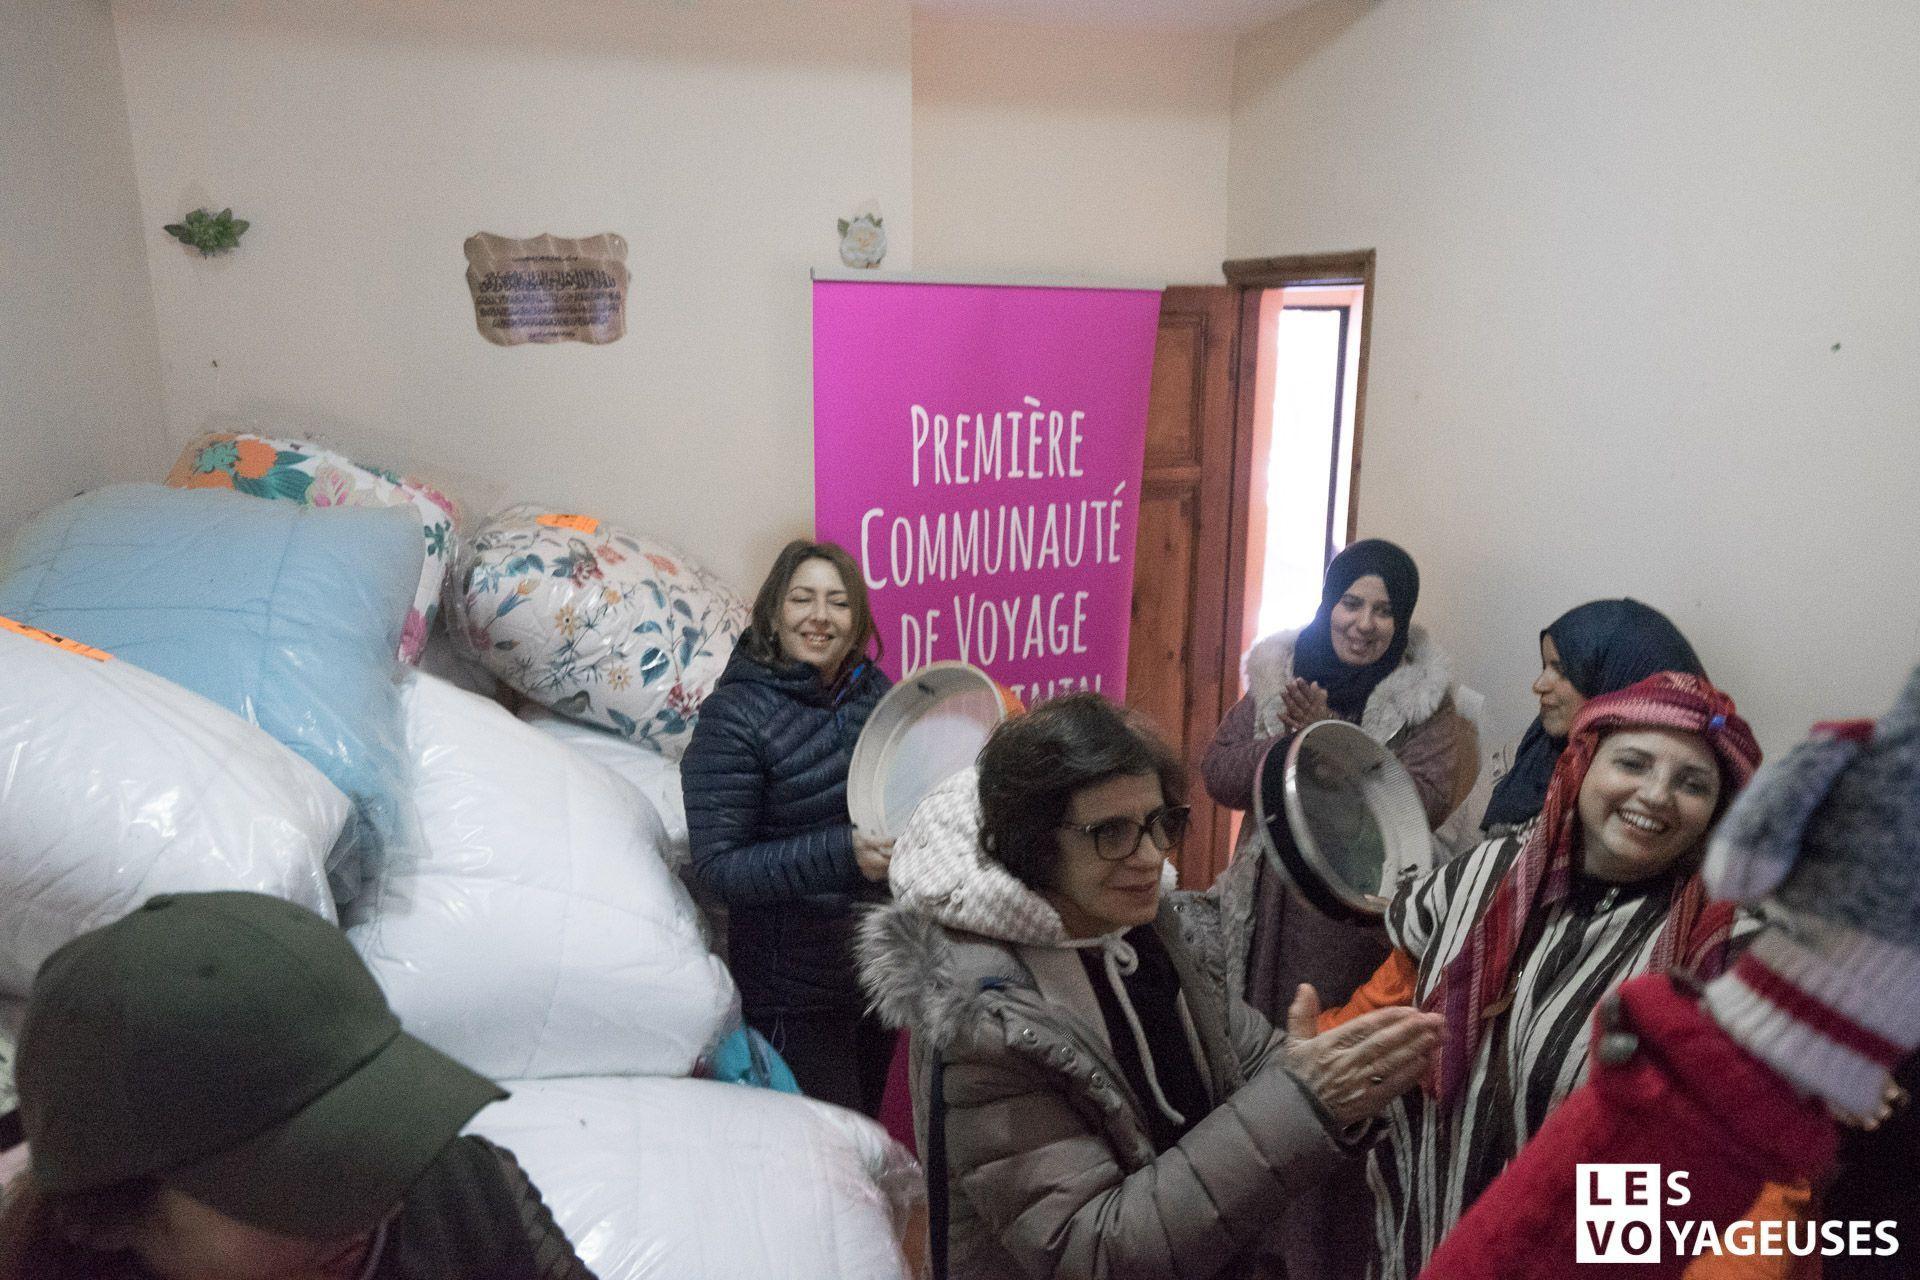 Les-voyageuses-maroc-imlil-hiver-09877